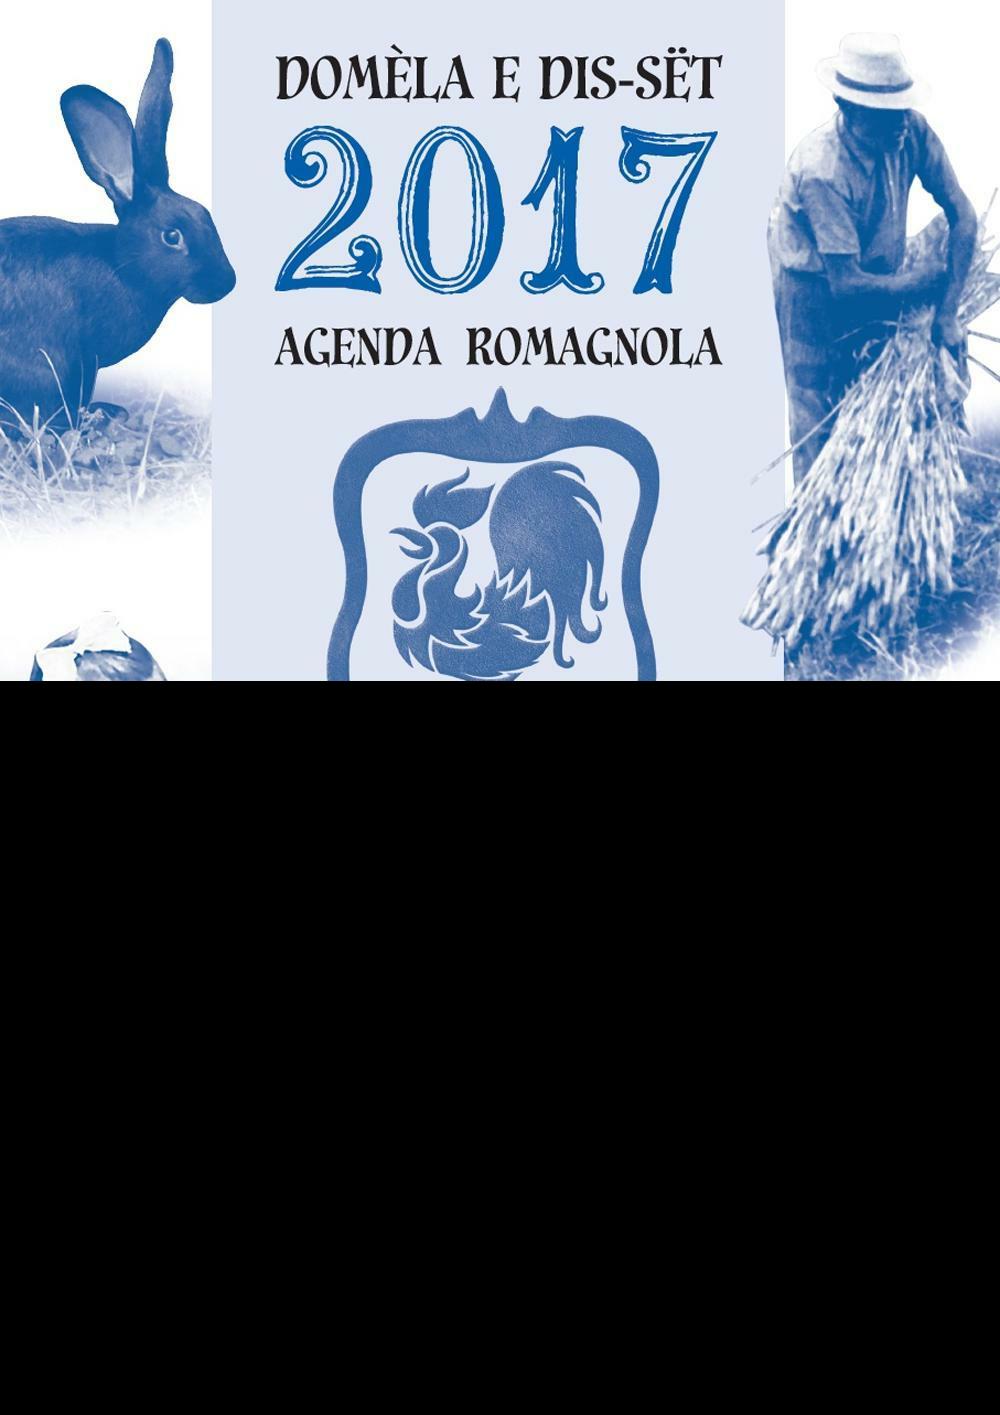 Domèla e dis-sët. Agenda romagnola 2017  ISBN:9788895297729